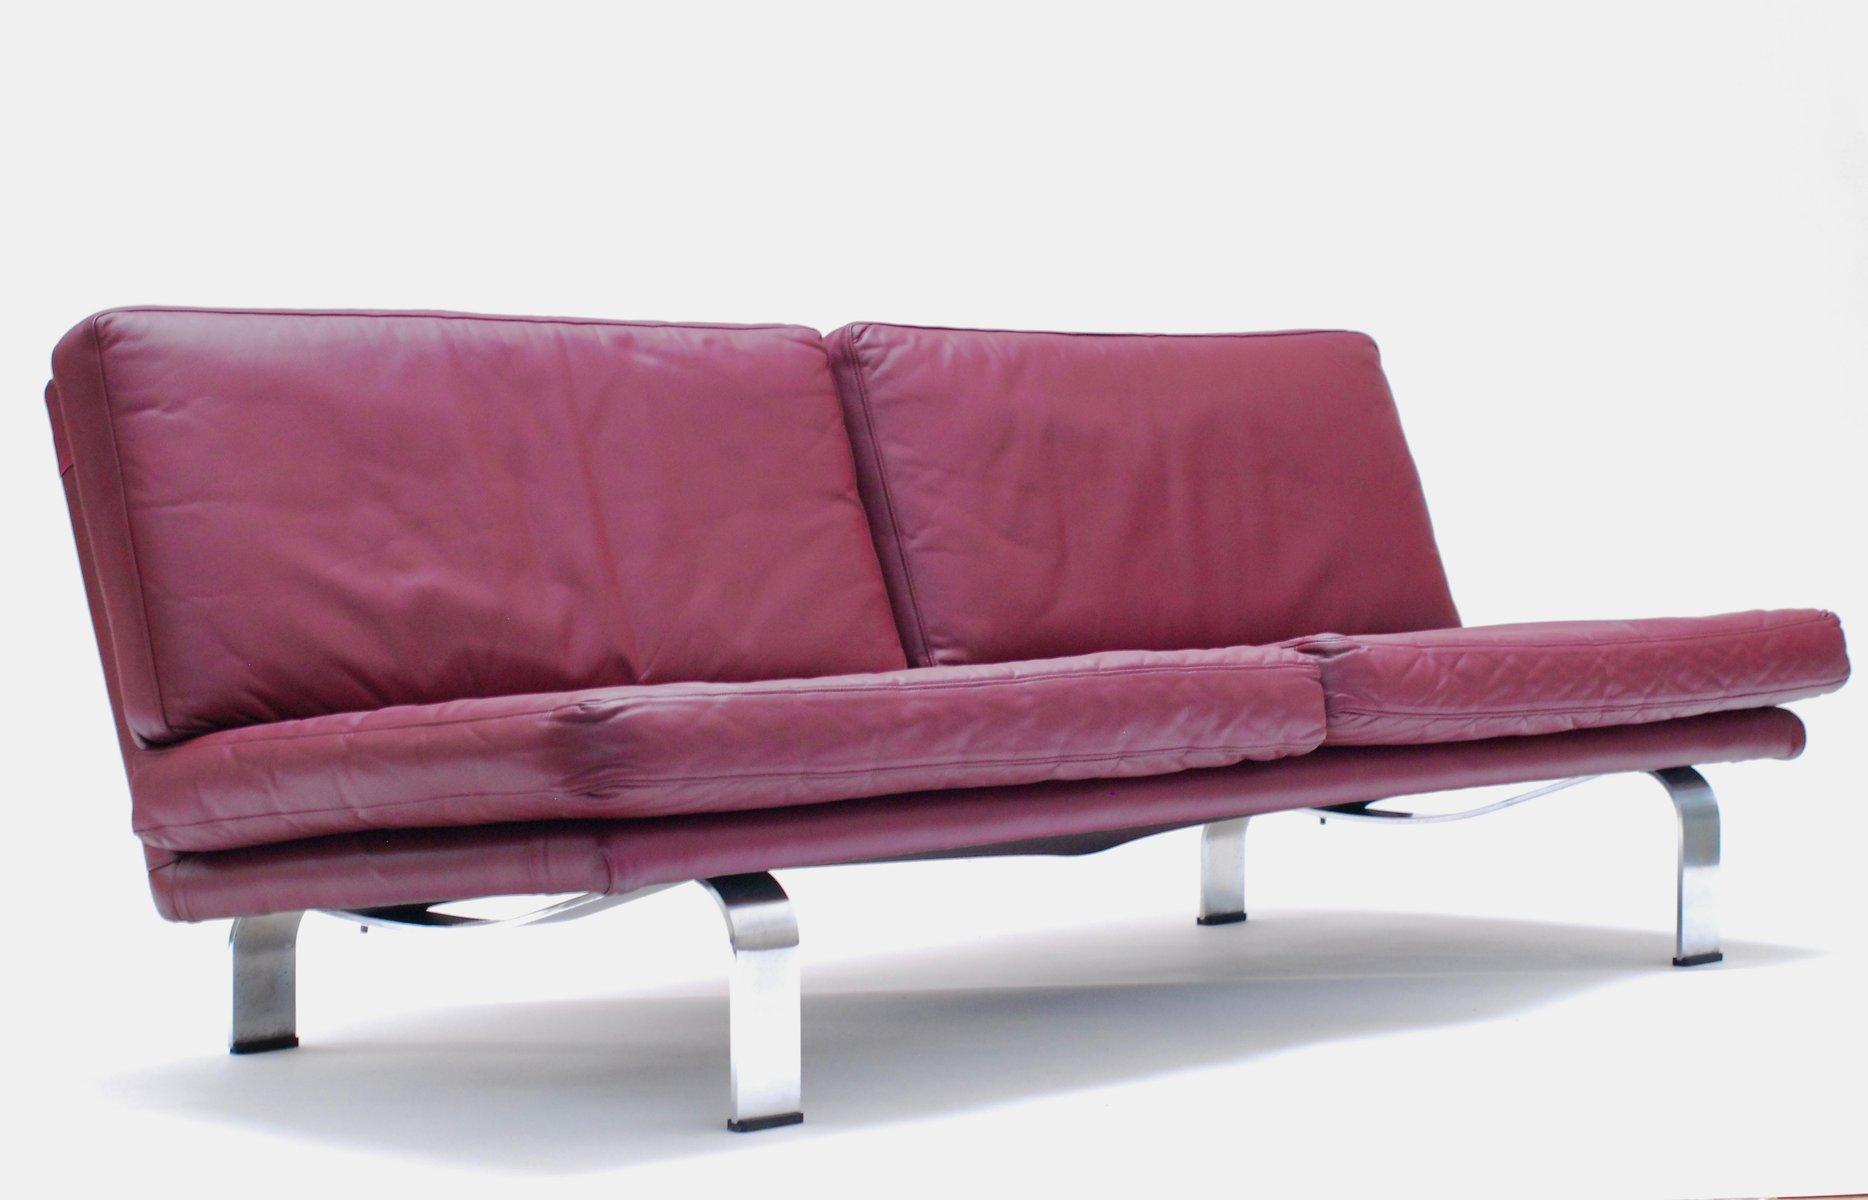 plum leather sofa lazy boy sleeper air mattress pump italian 1960s for sale at pamono